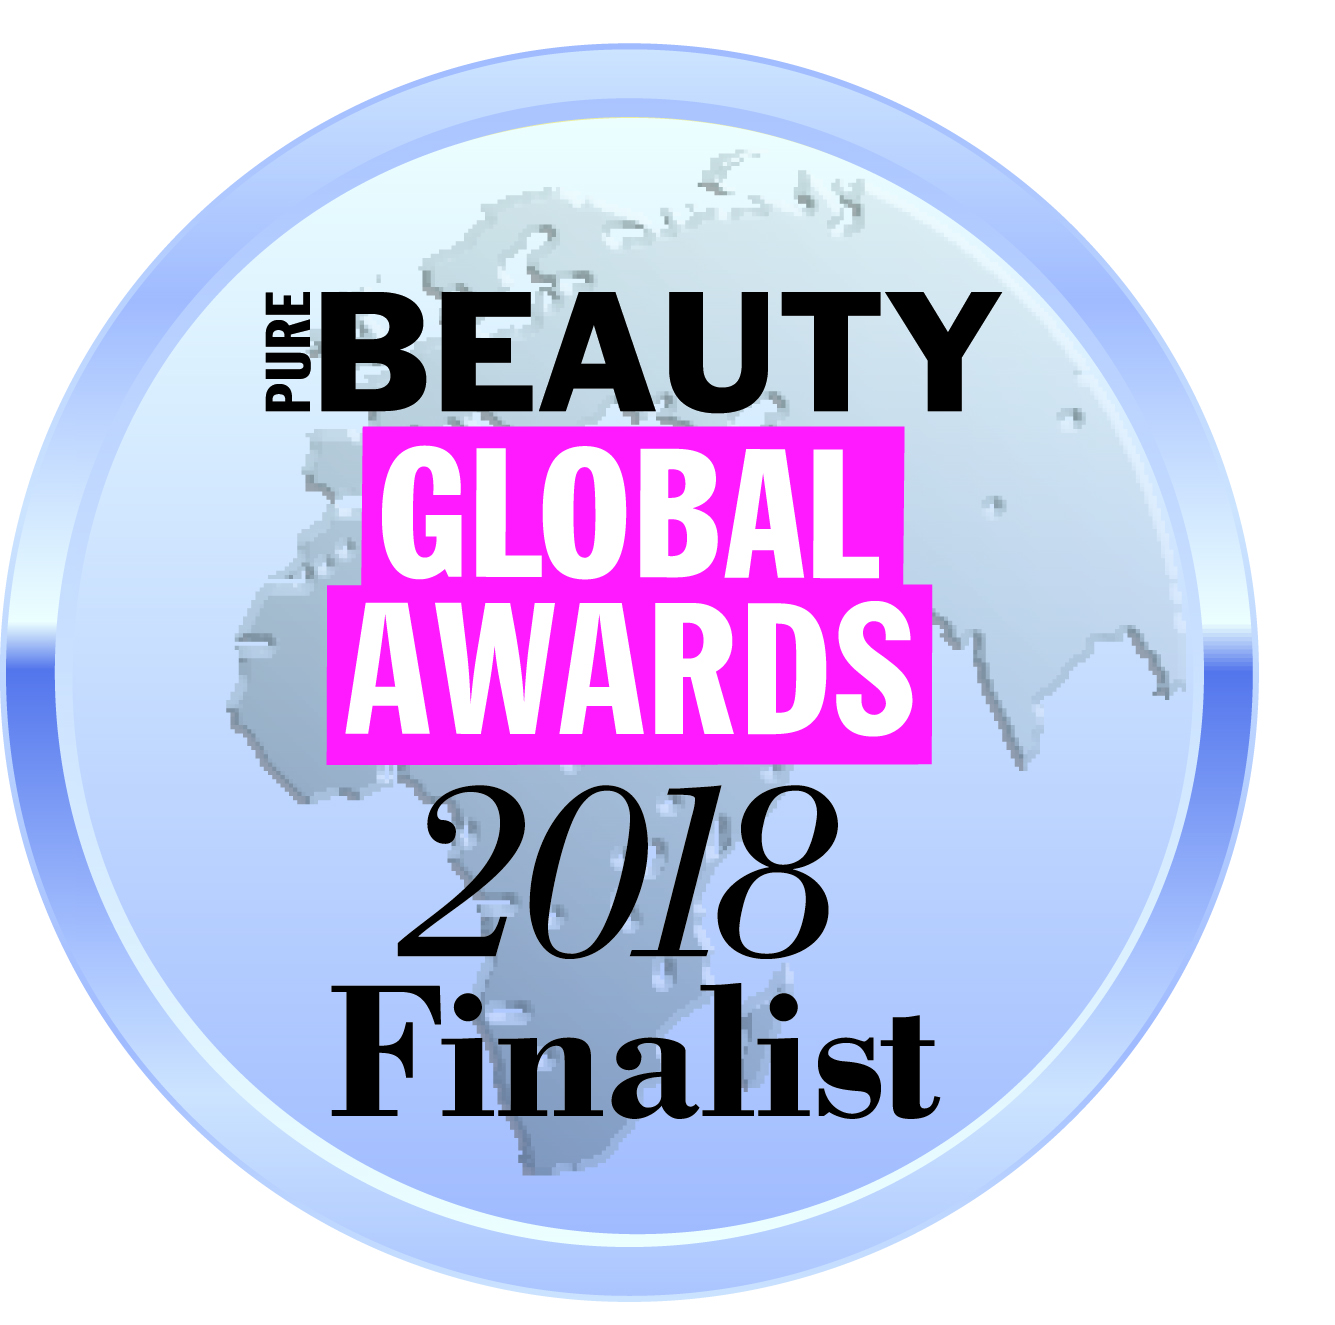 489013_pb_global_awards_finalist_2018.jpg